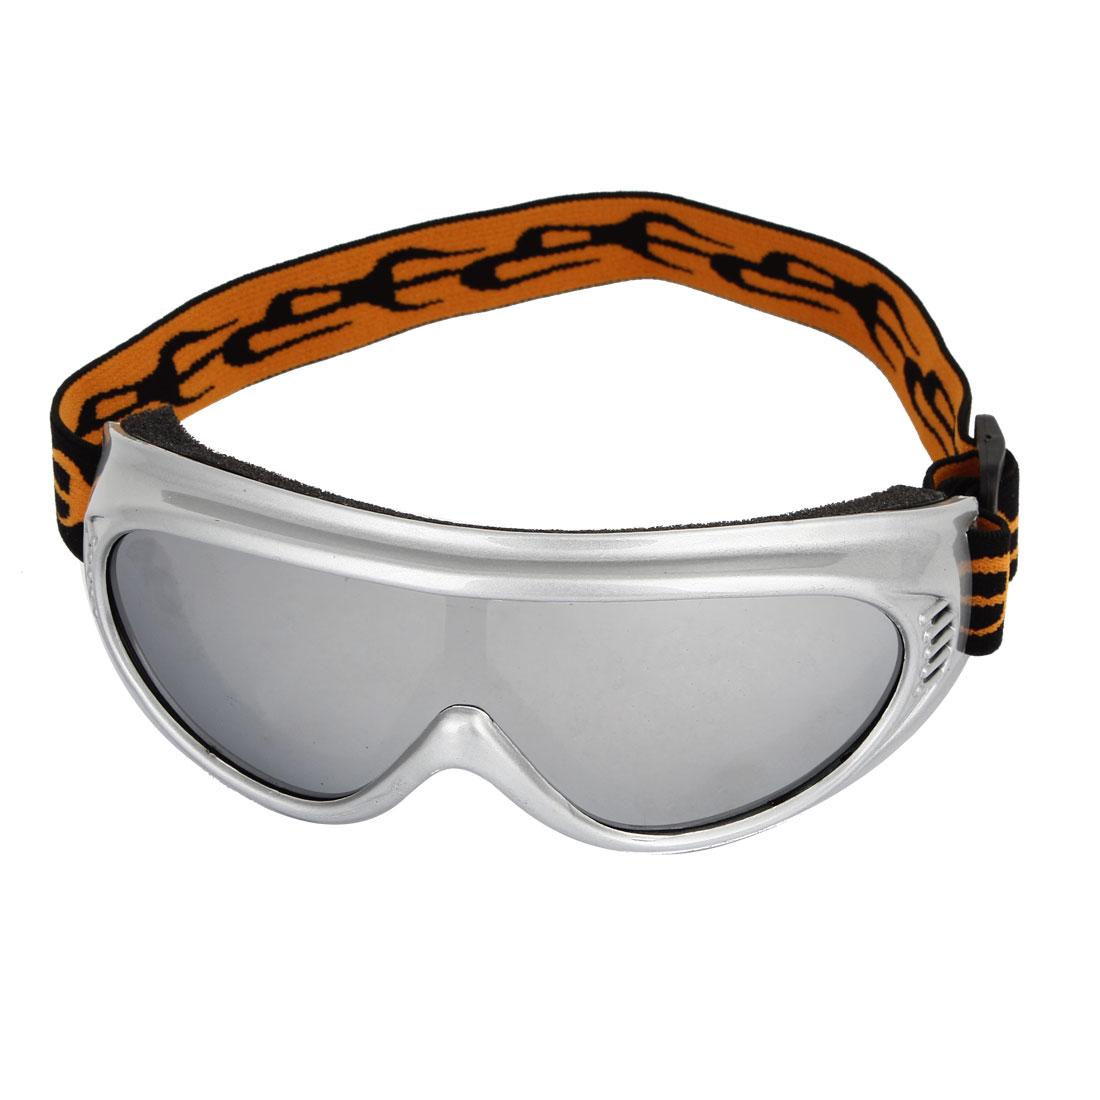 Unisex Plastic Full Frame Clear Len Motorbike Snowboarding Eye Protector Goggles